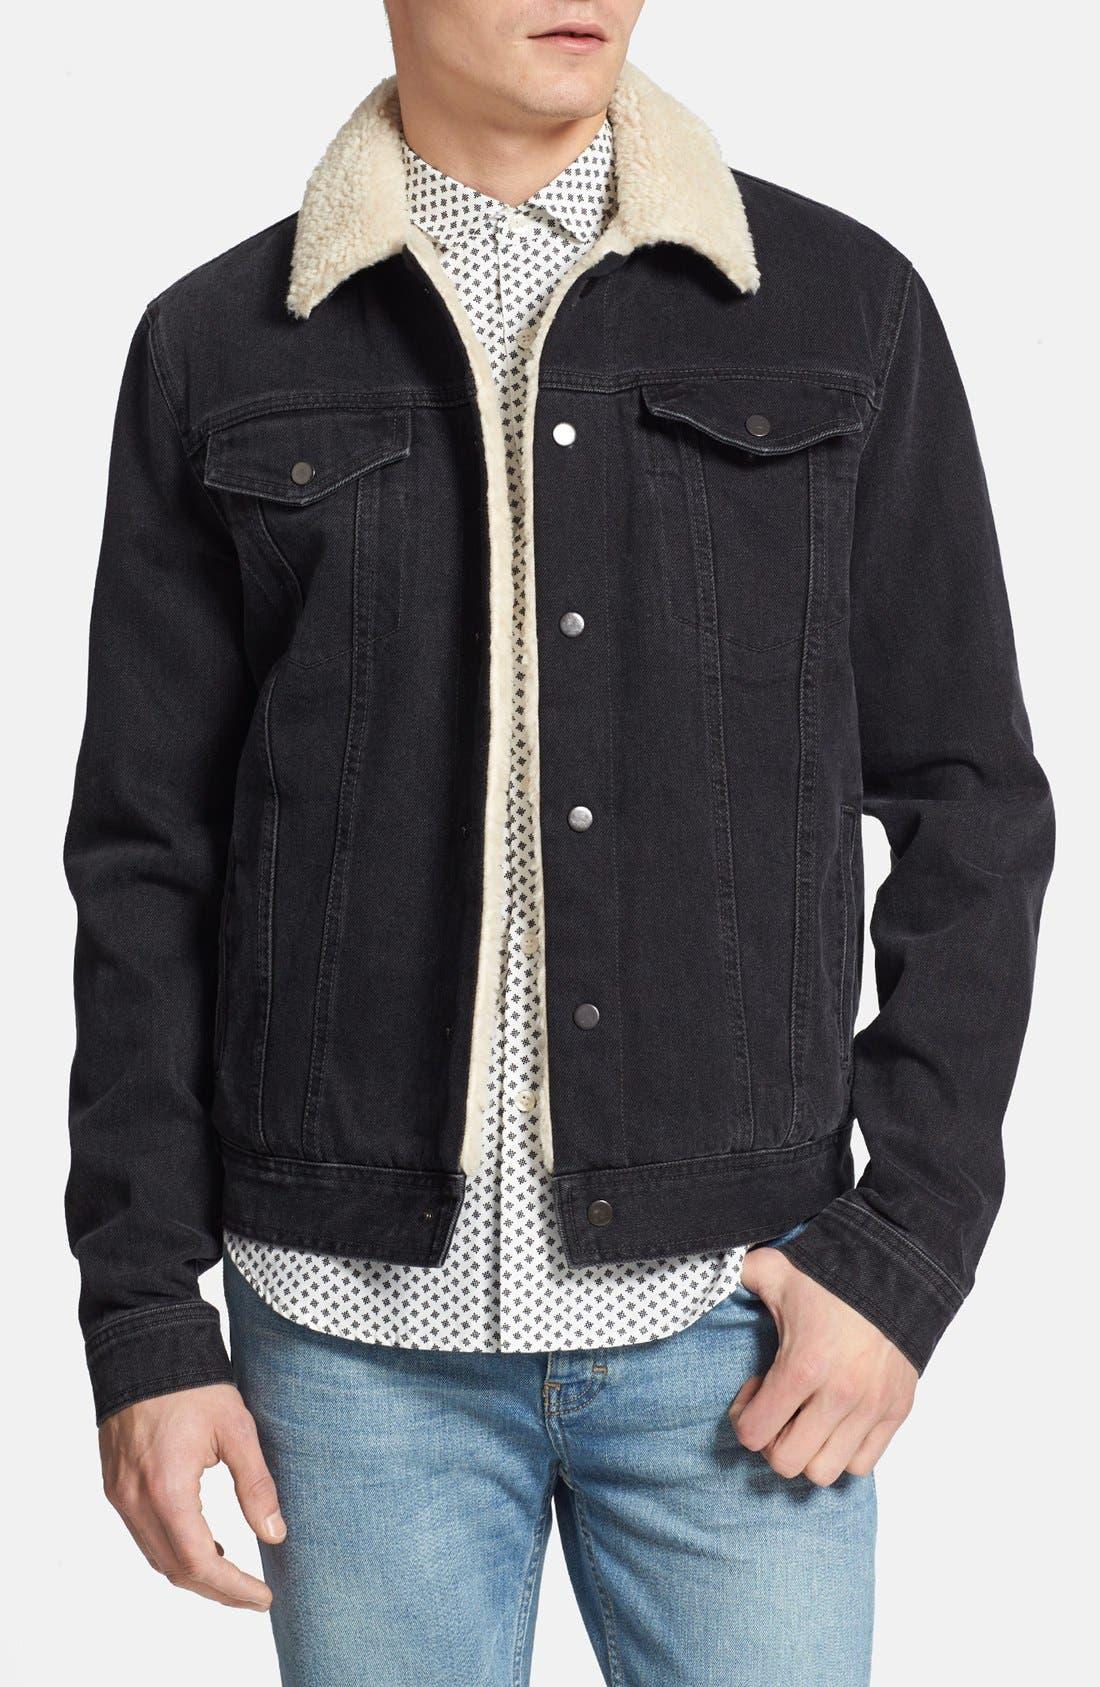 Alternate Image 1 Selected - Topman Lined Denim Jacket